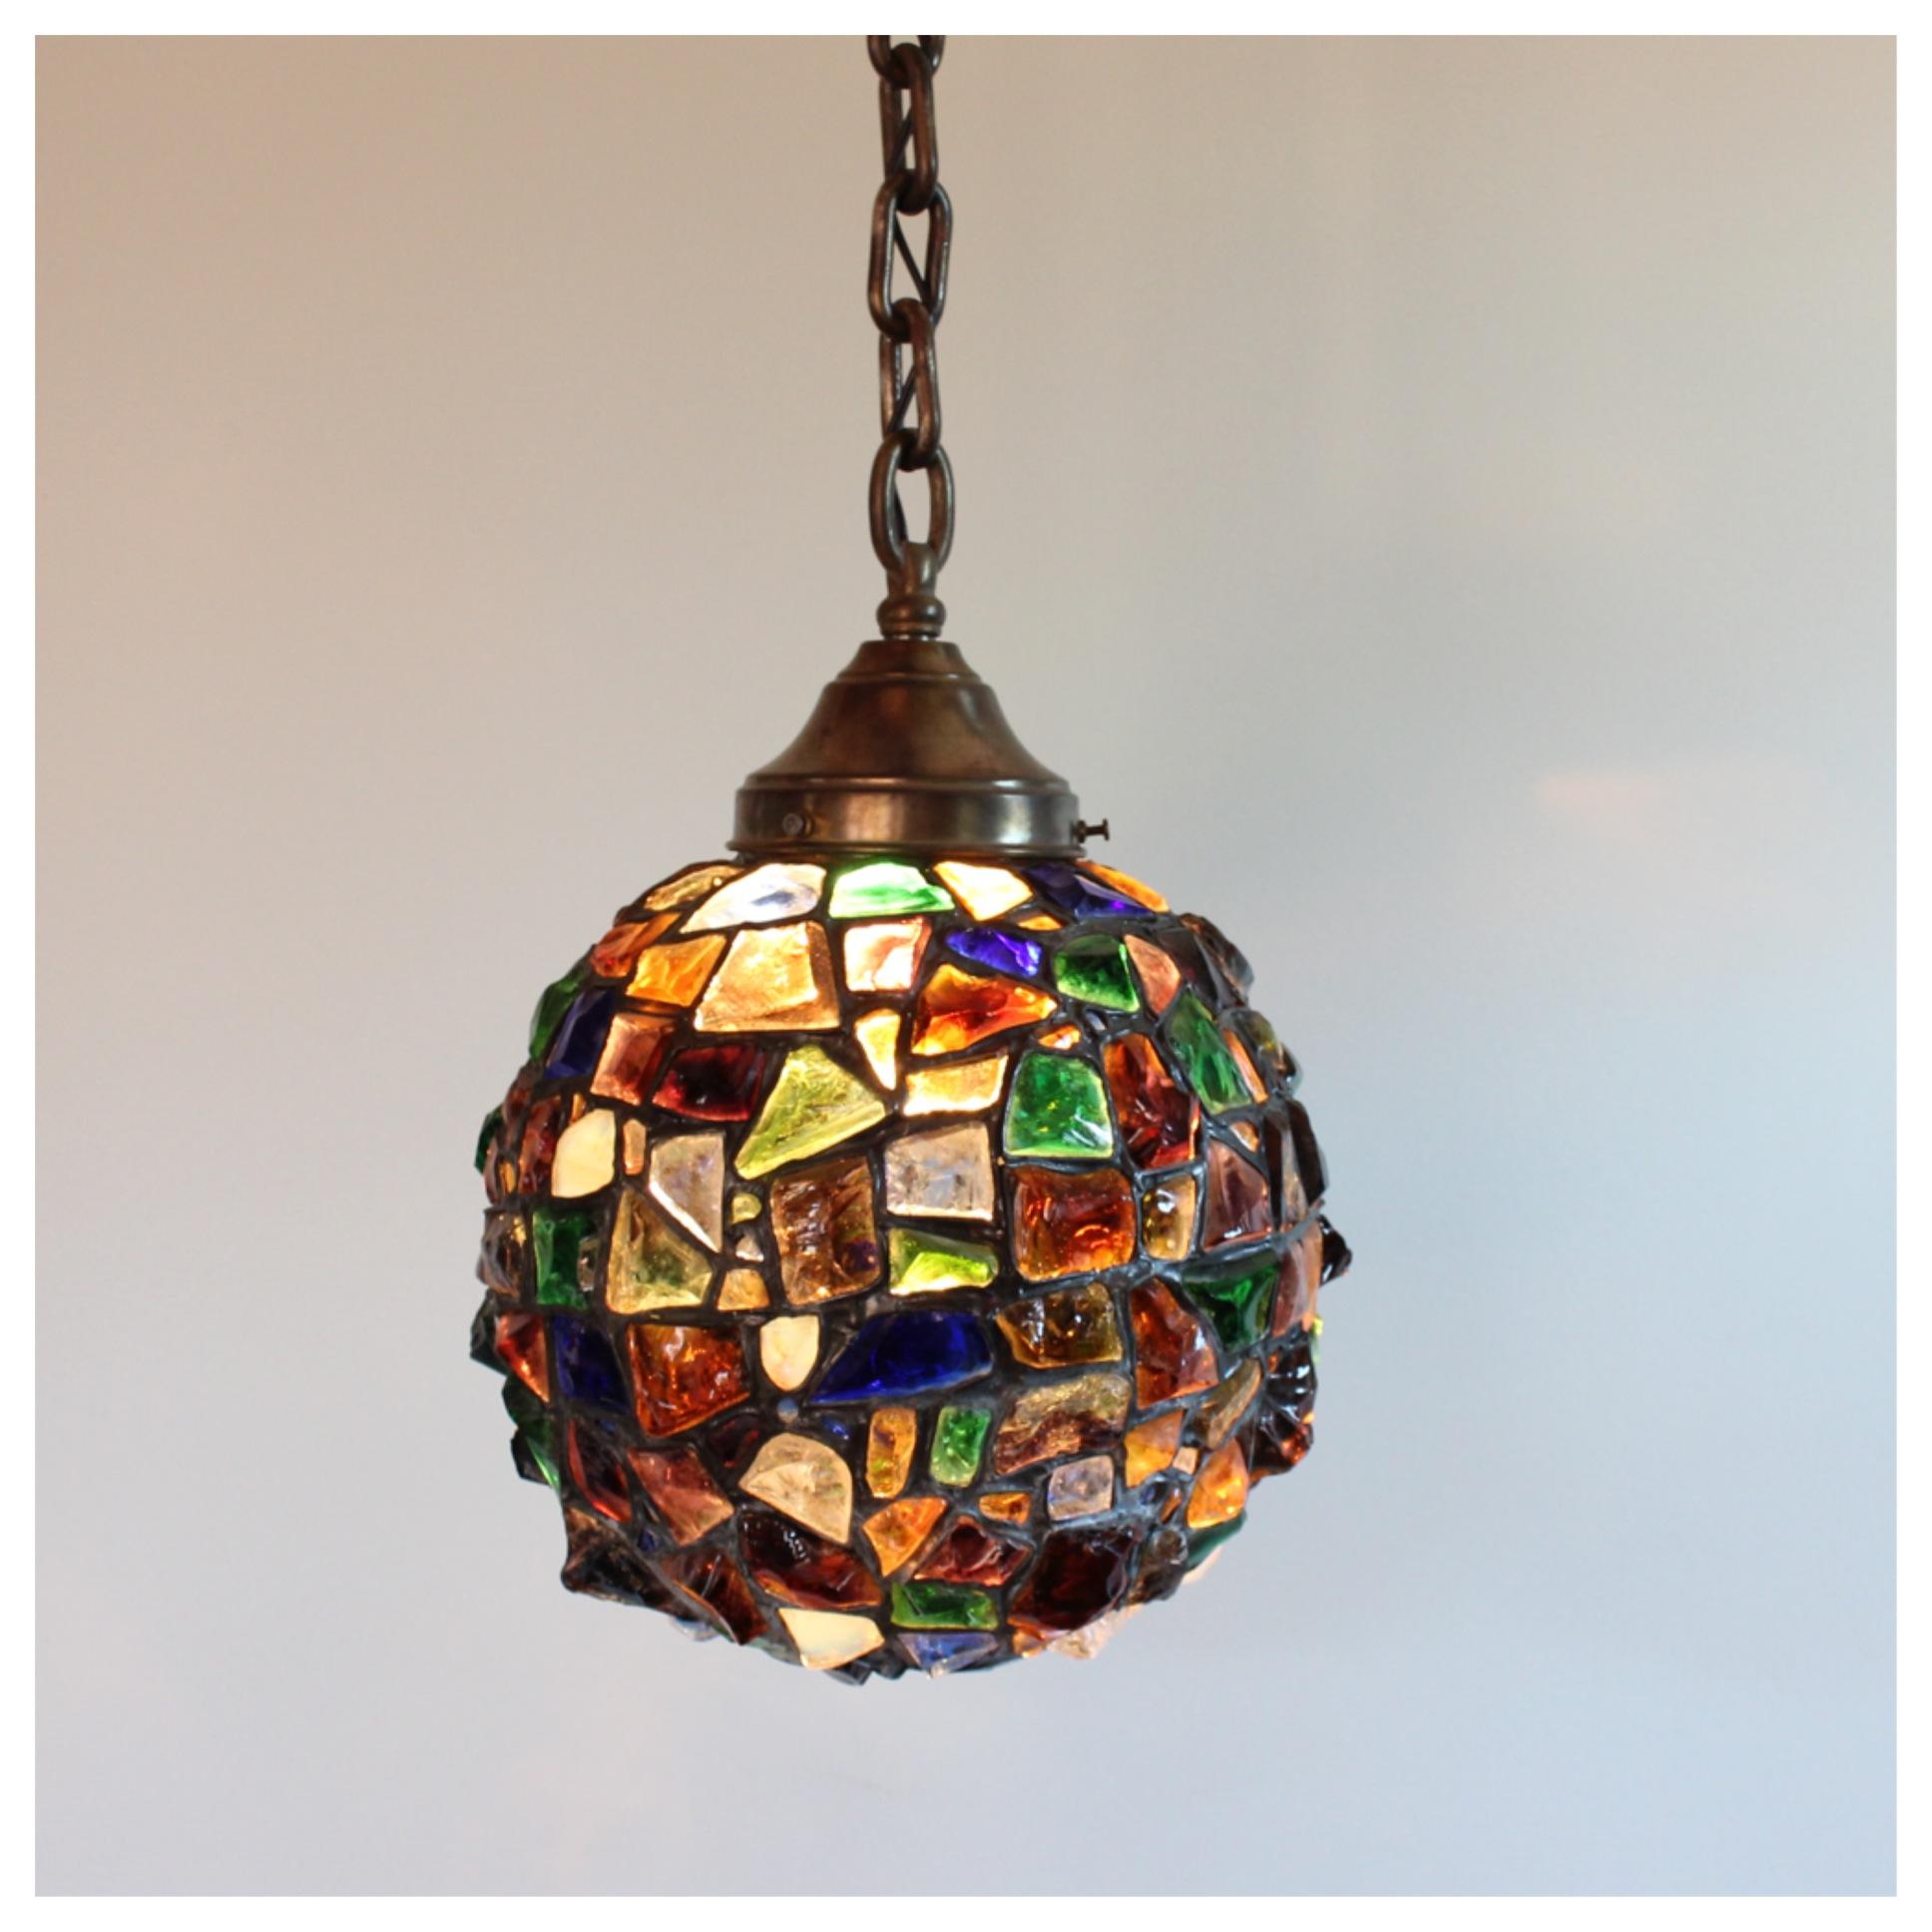 A8086 Austrian Chunk Glass Globe Bogart Bremmer